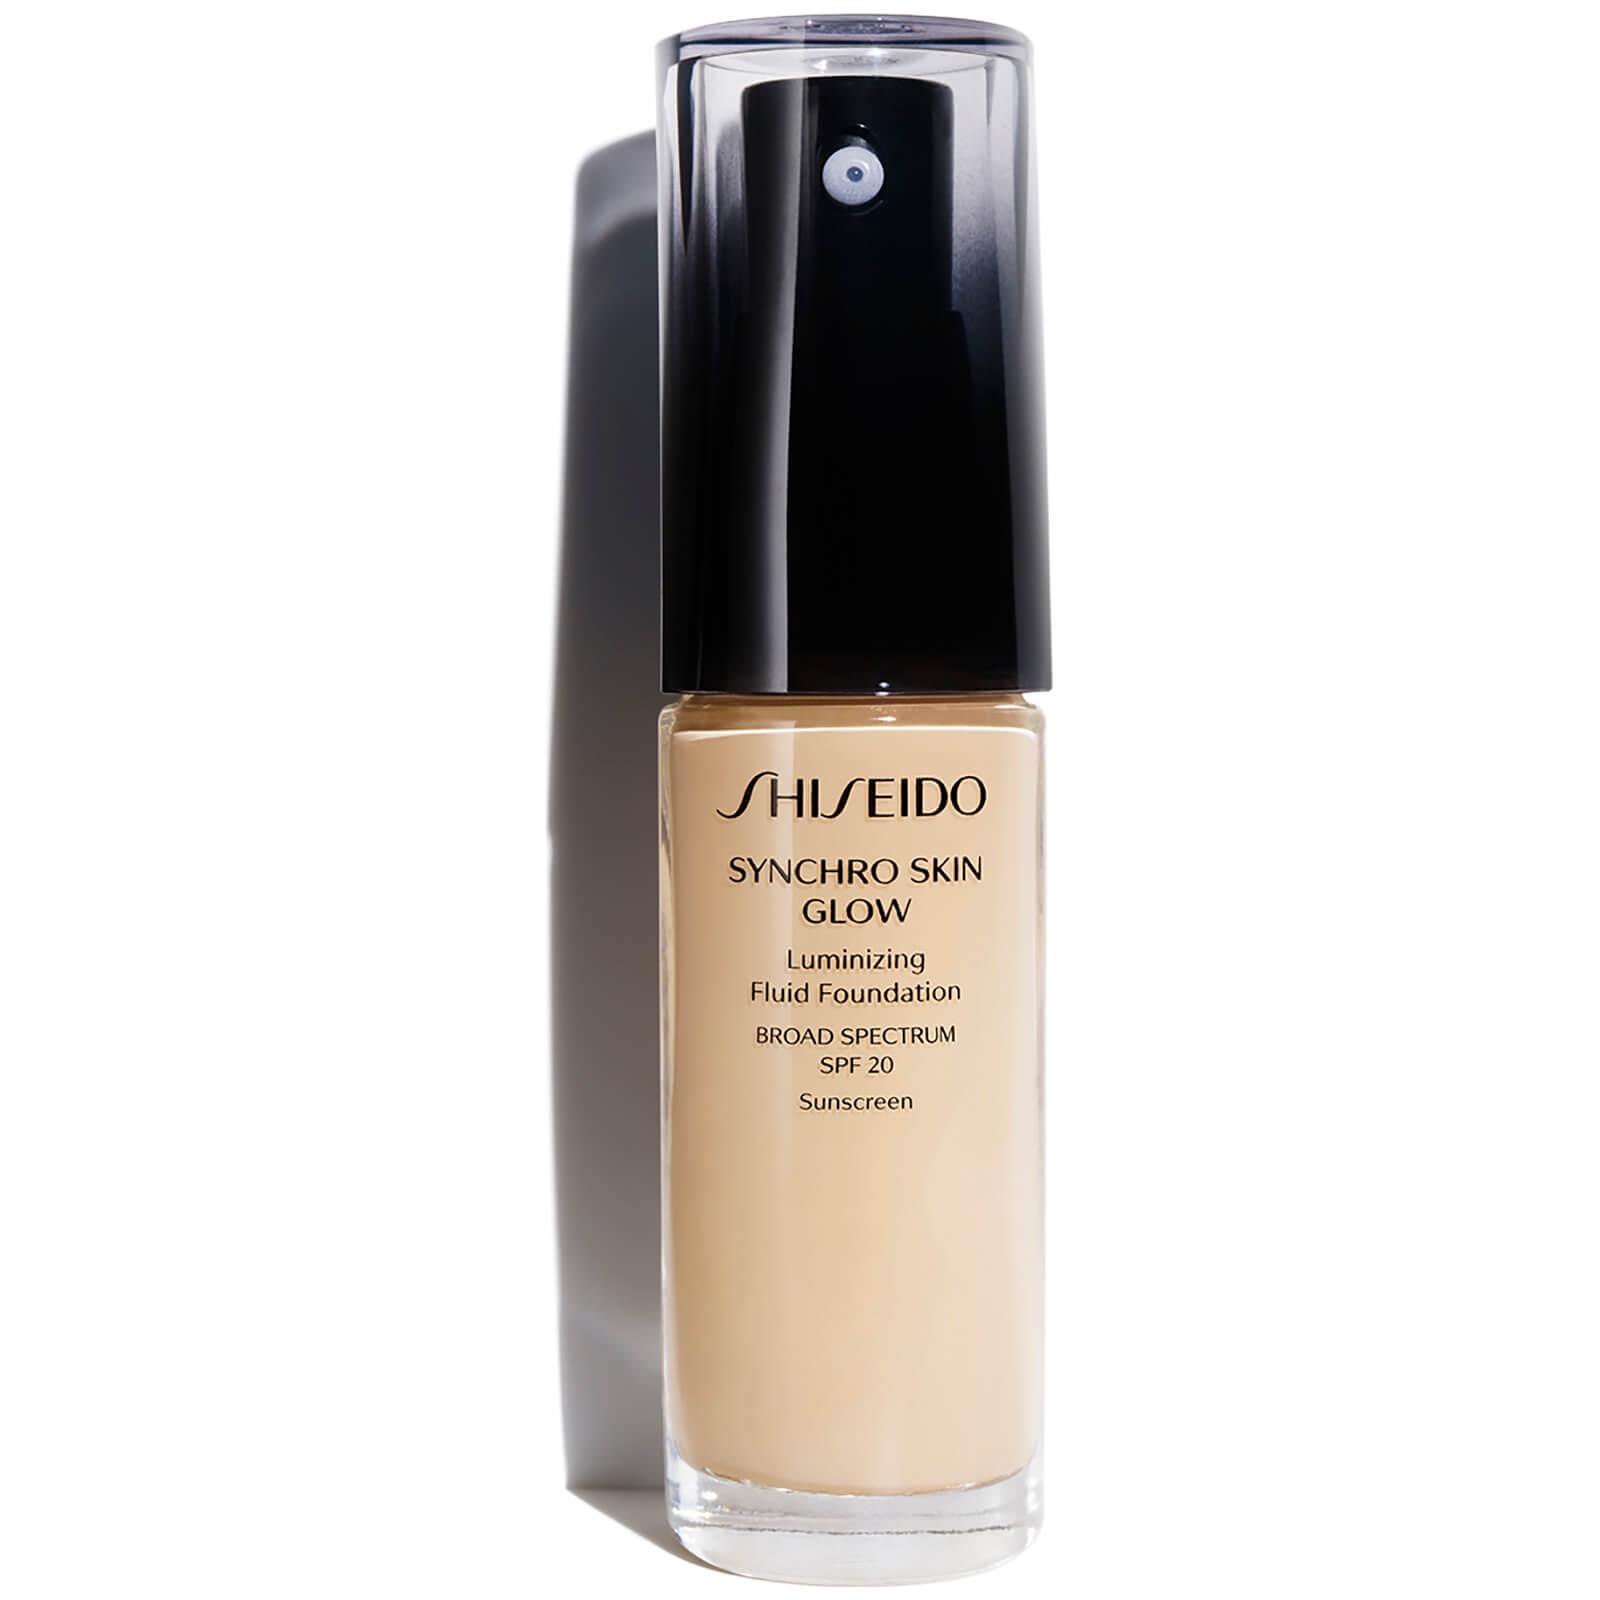 Shiseido Synchro Skin Glow Luminizing Foundation 30 ml (varie tonalità) - Golden 2